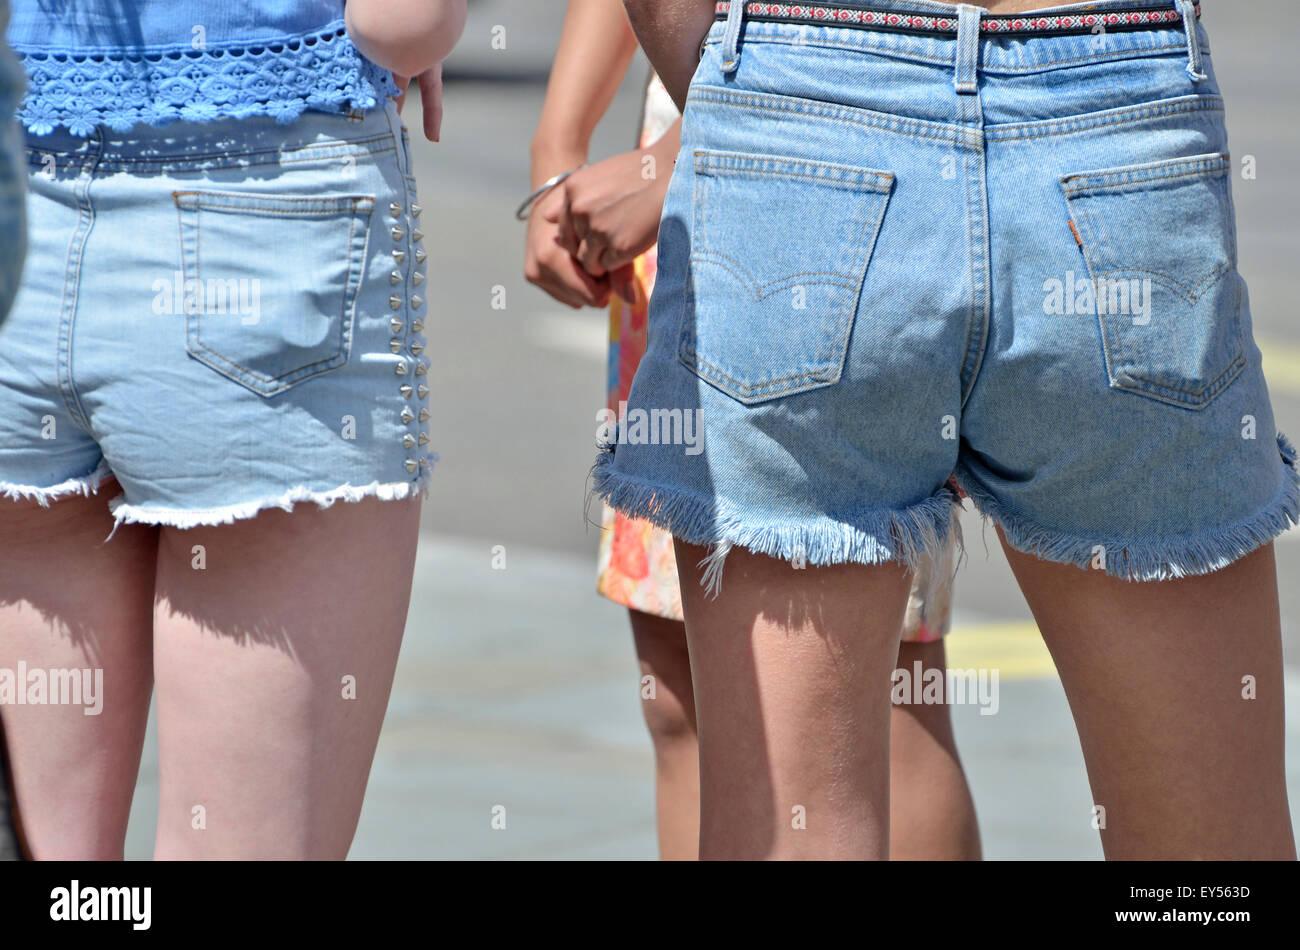 girl wearing shorts stock photos & girl wearing shorts stock images